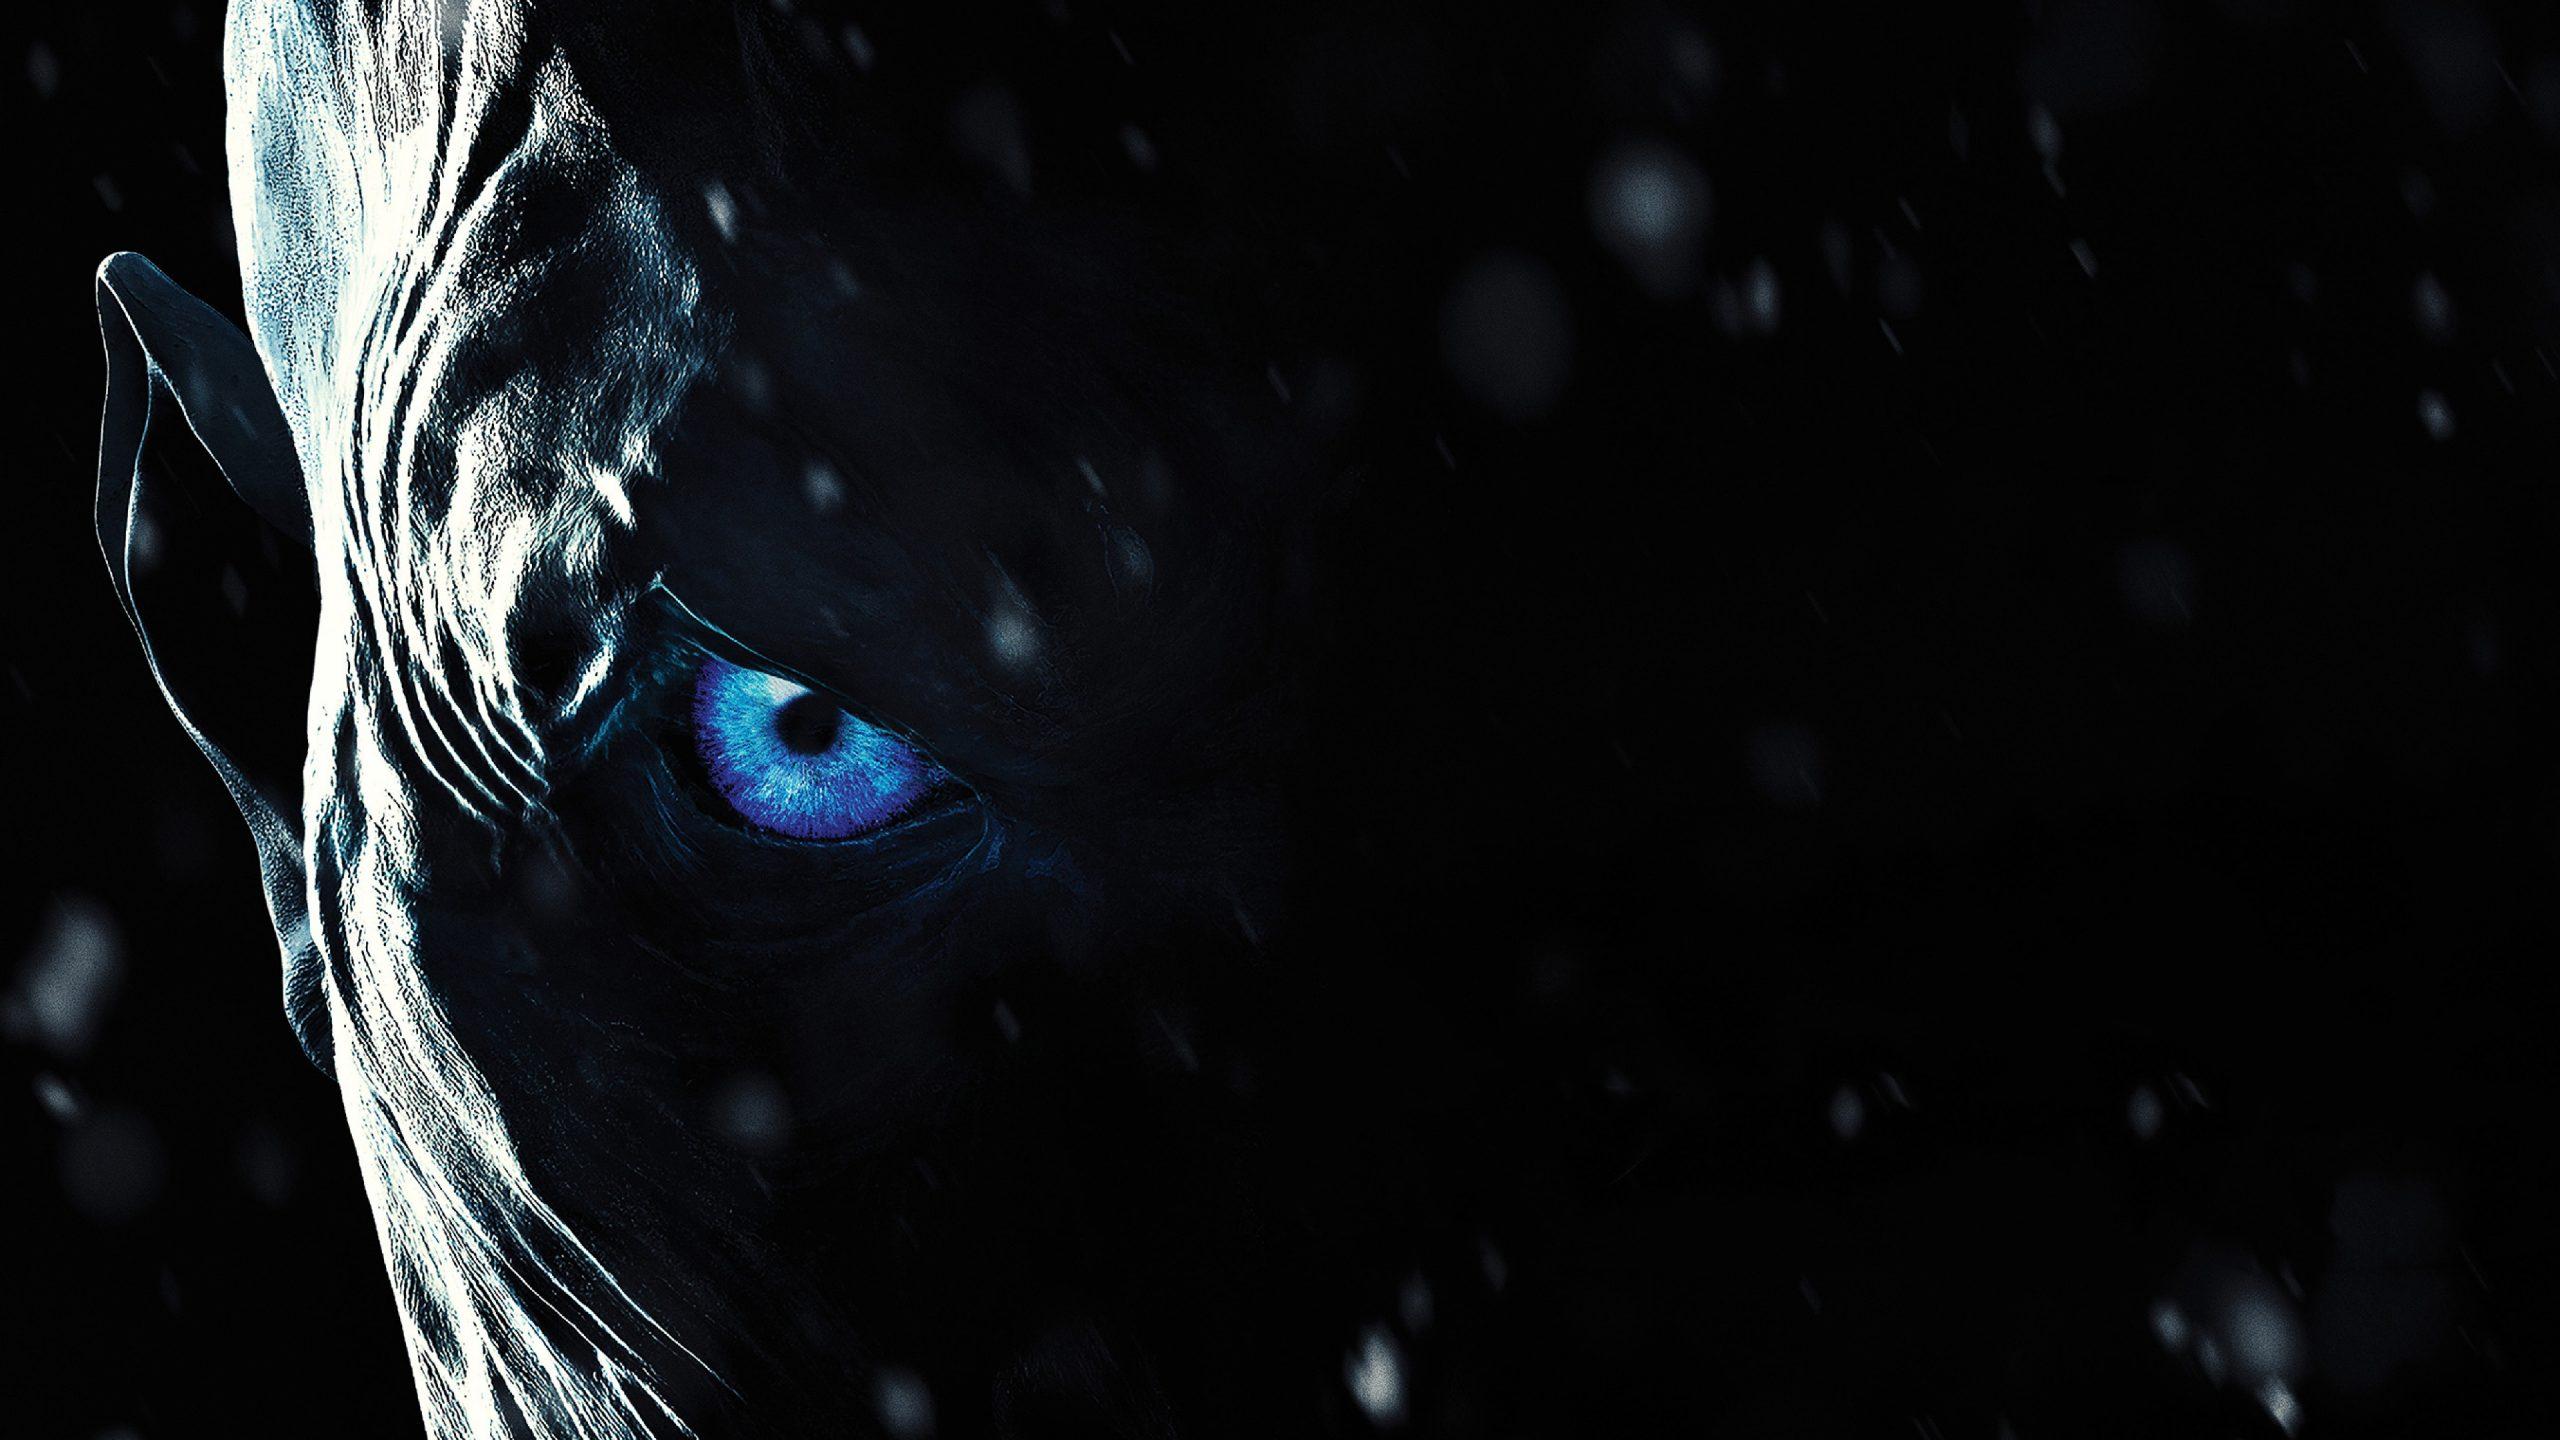 Game of Thrones Season 7 White Walkers TV Show 4K ...